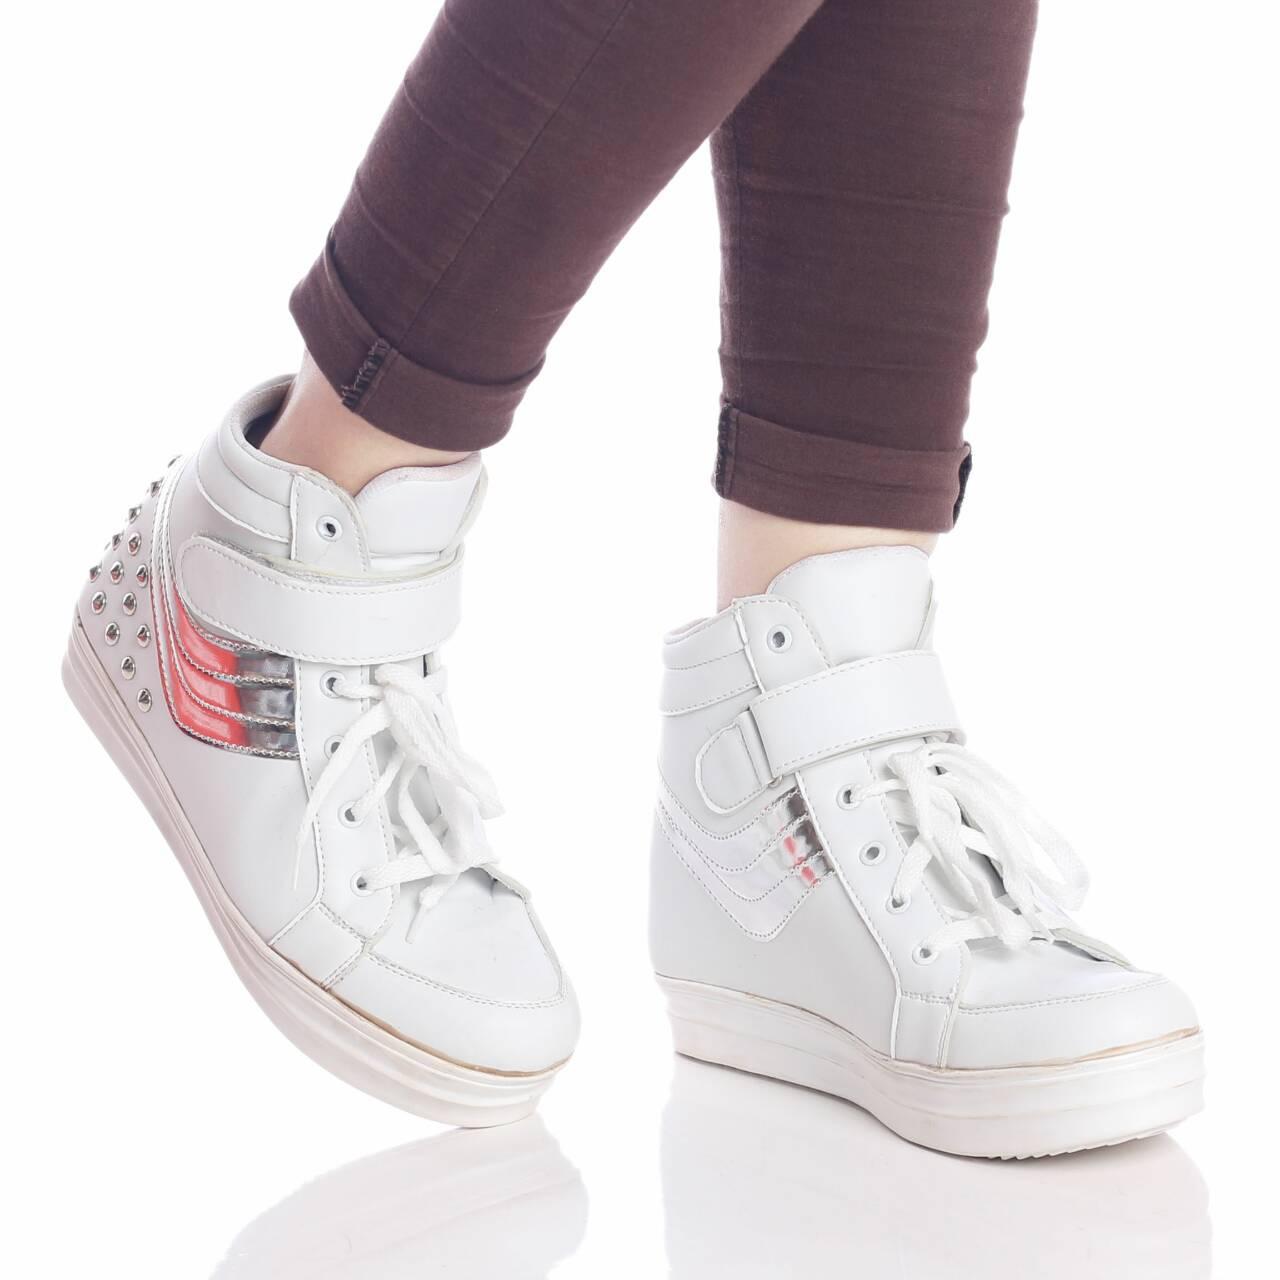 Promo sepatu murah wanita cewek sneaker hidden wedges 5cm awkarin Fashion